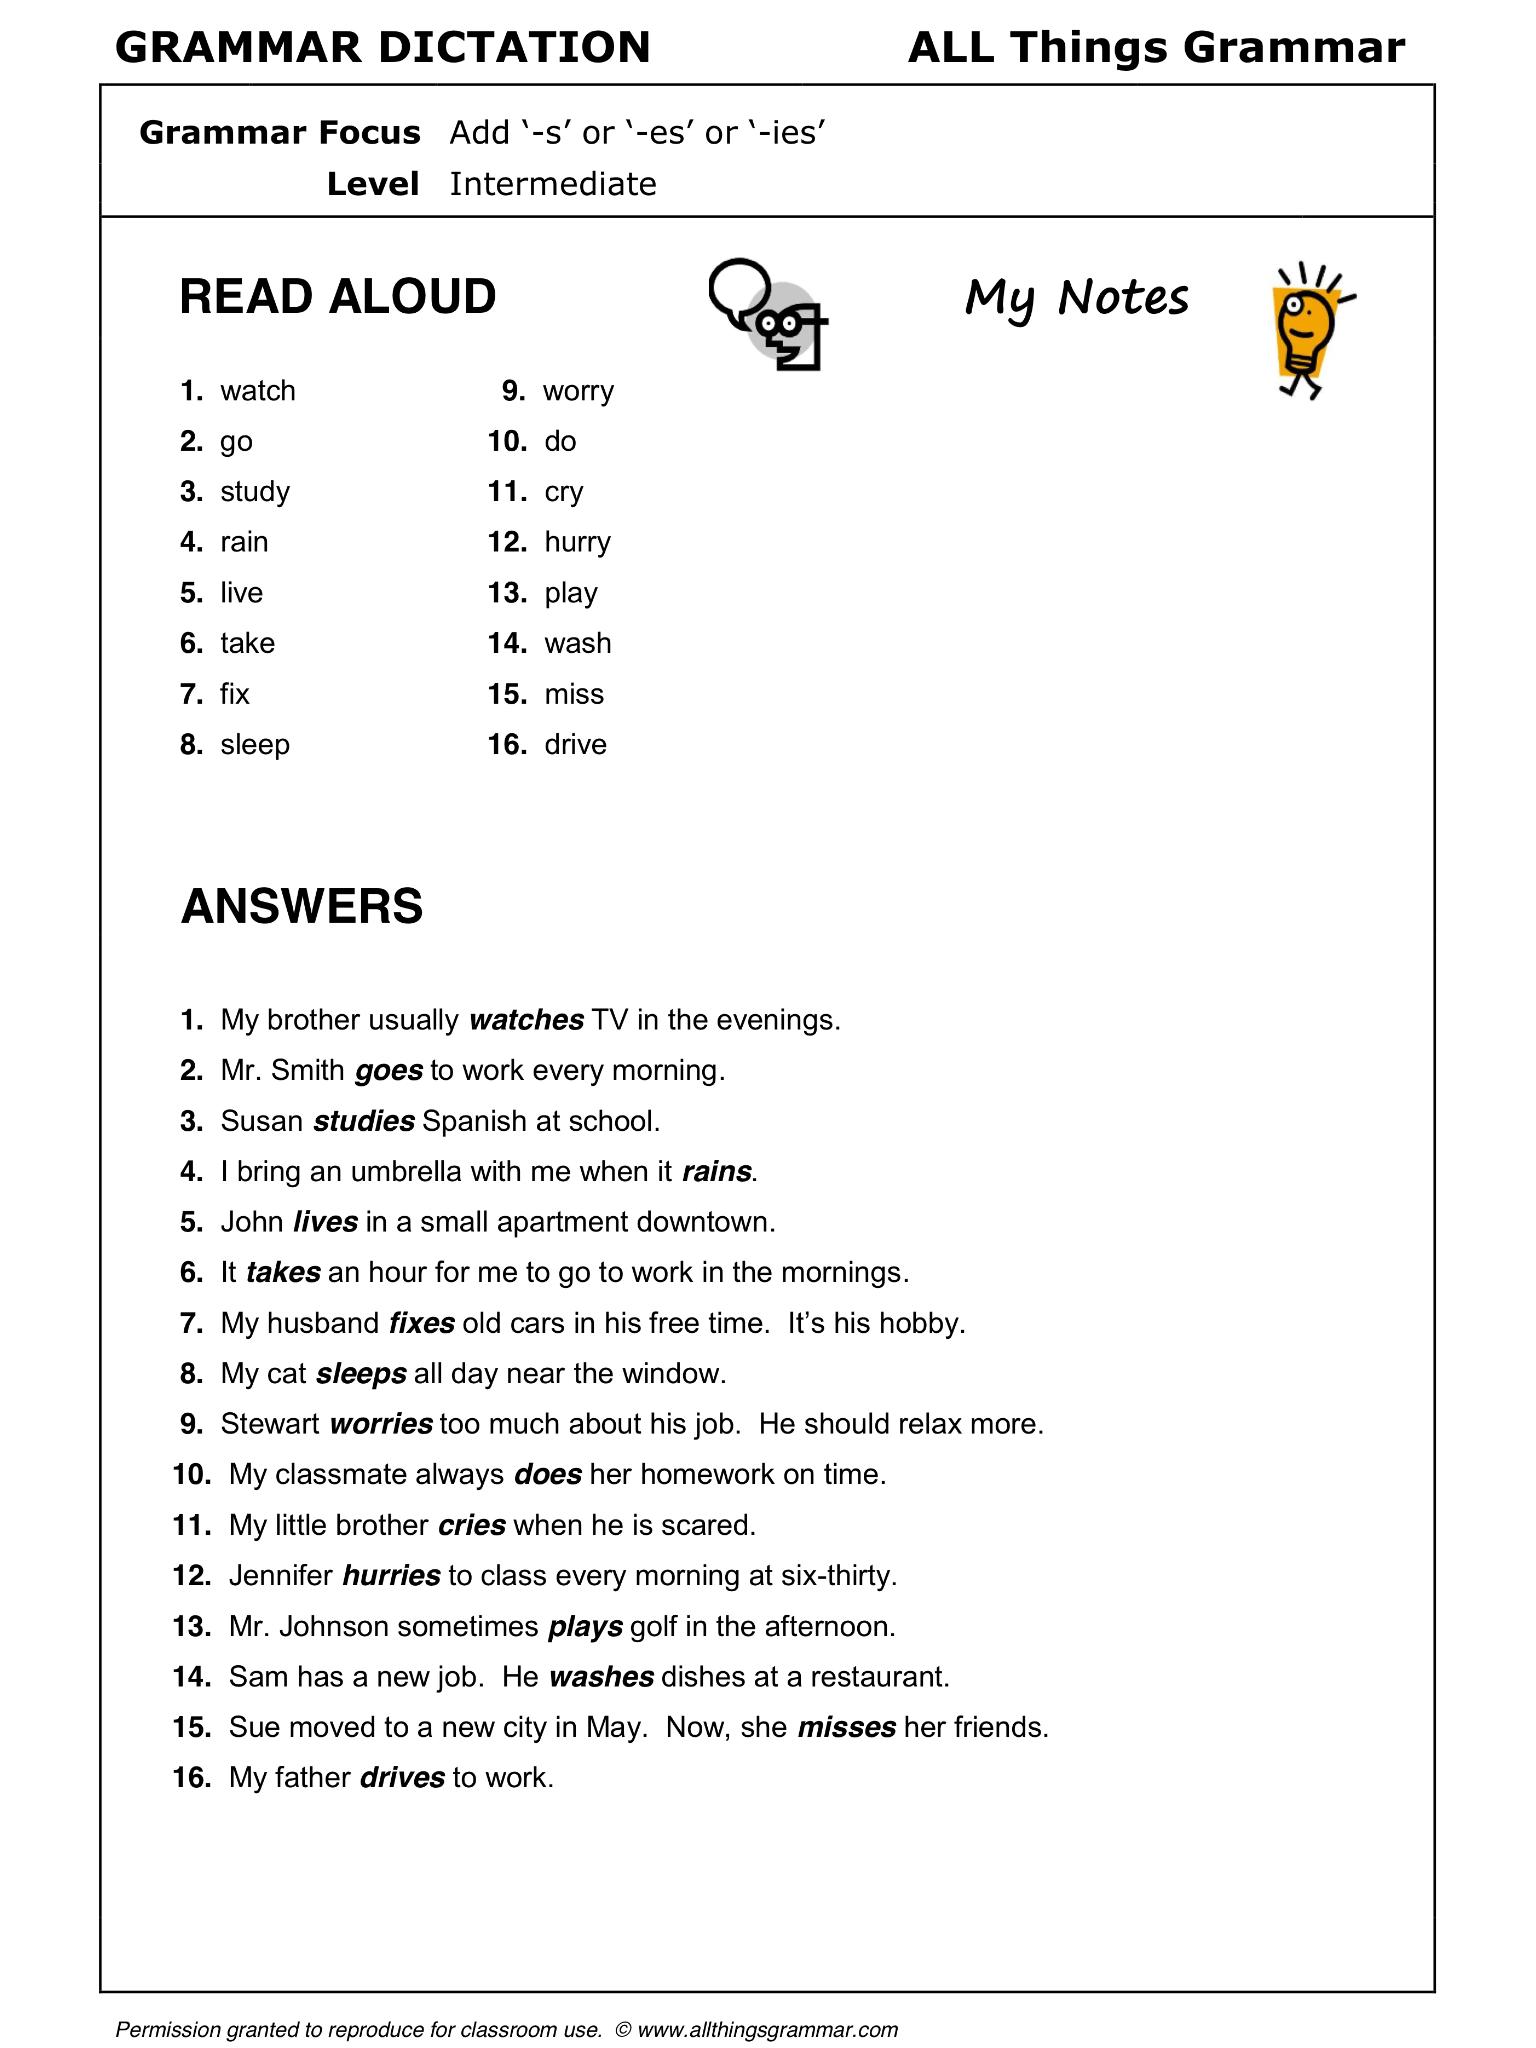 English Grammar Add S Or Es Or Ies Present Simple